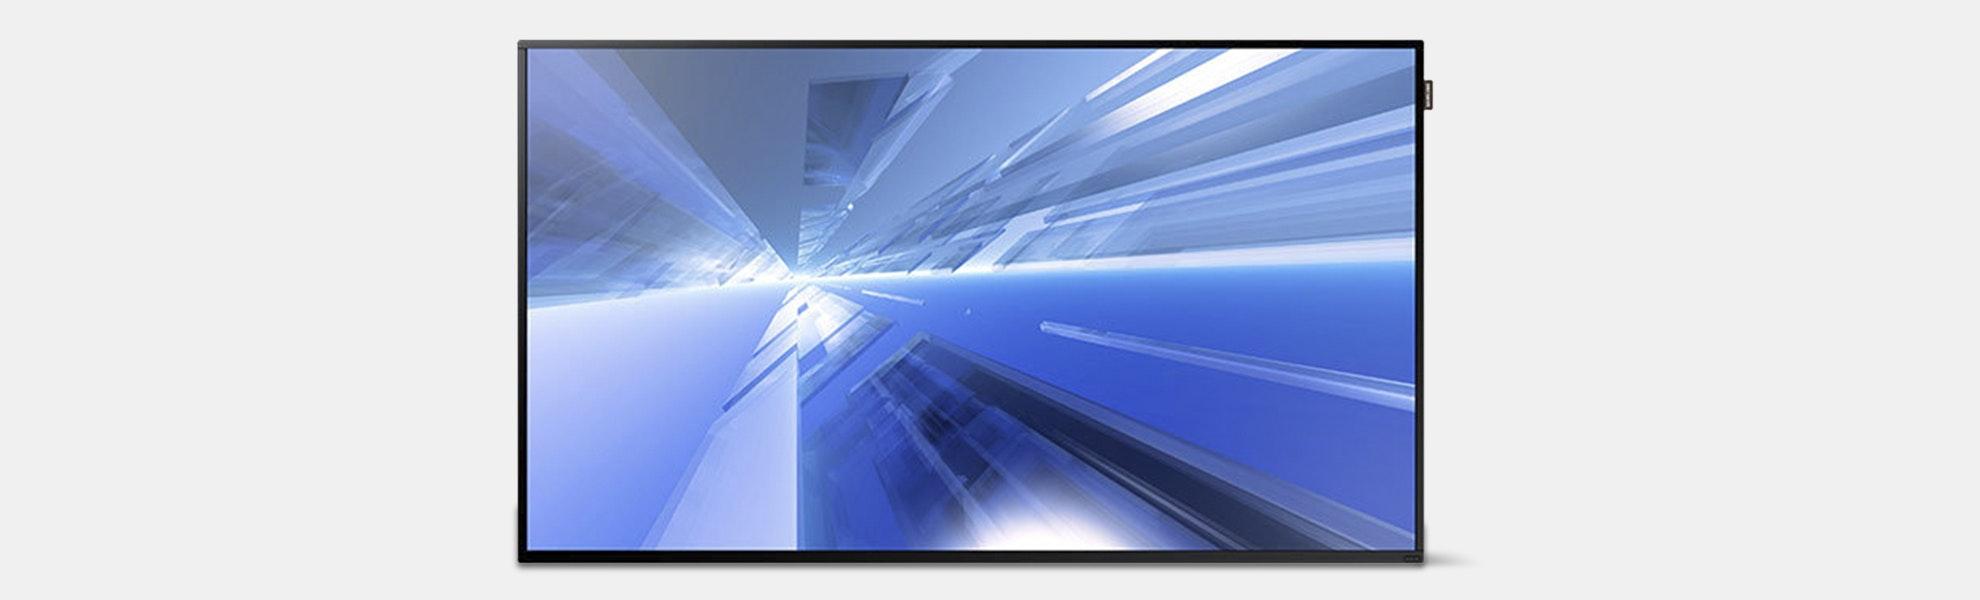 "Samsung 55"" Slim Direct-Lit Display for Business"